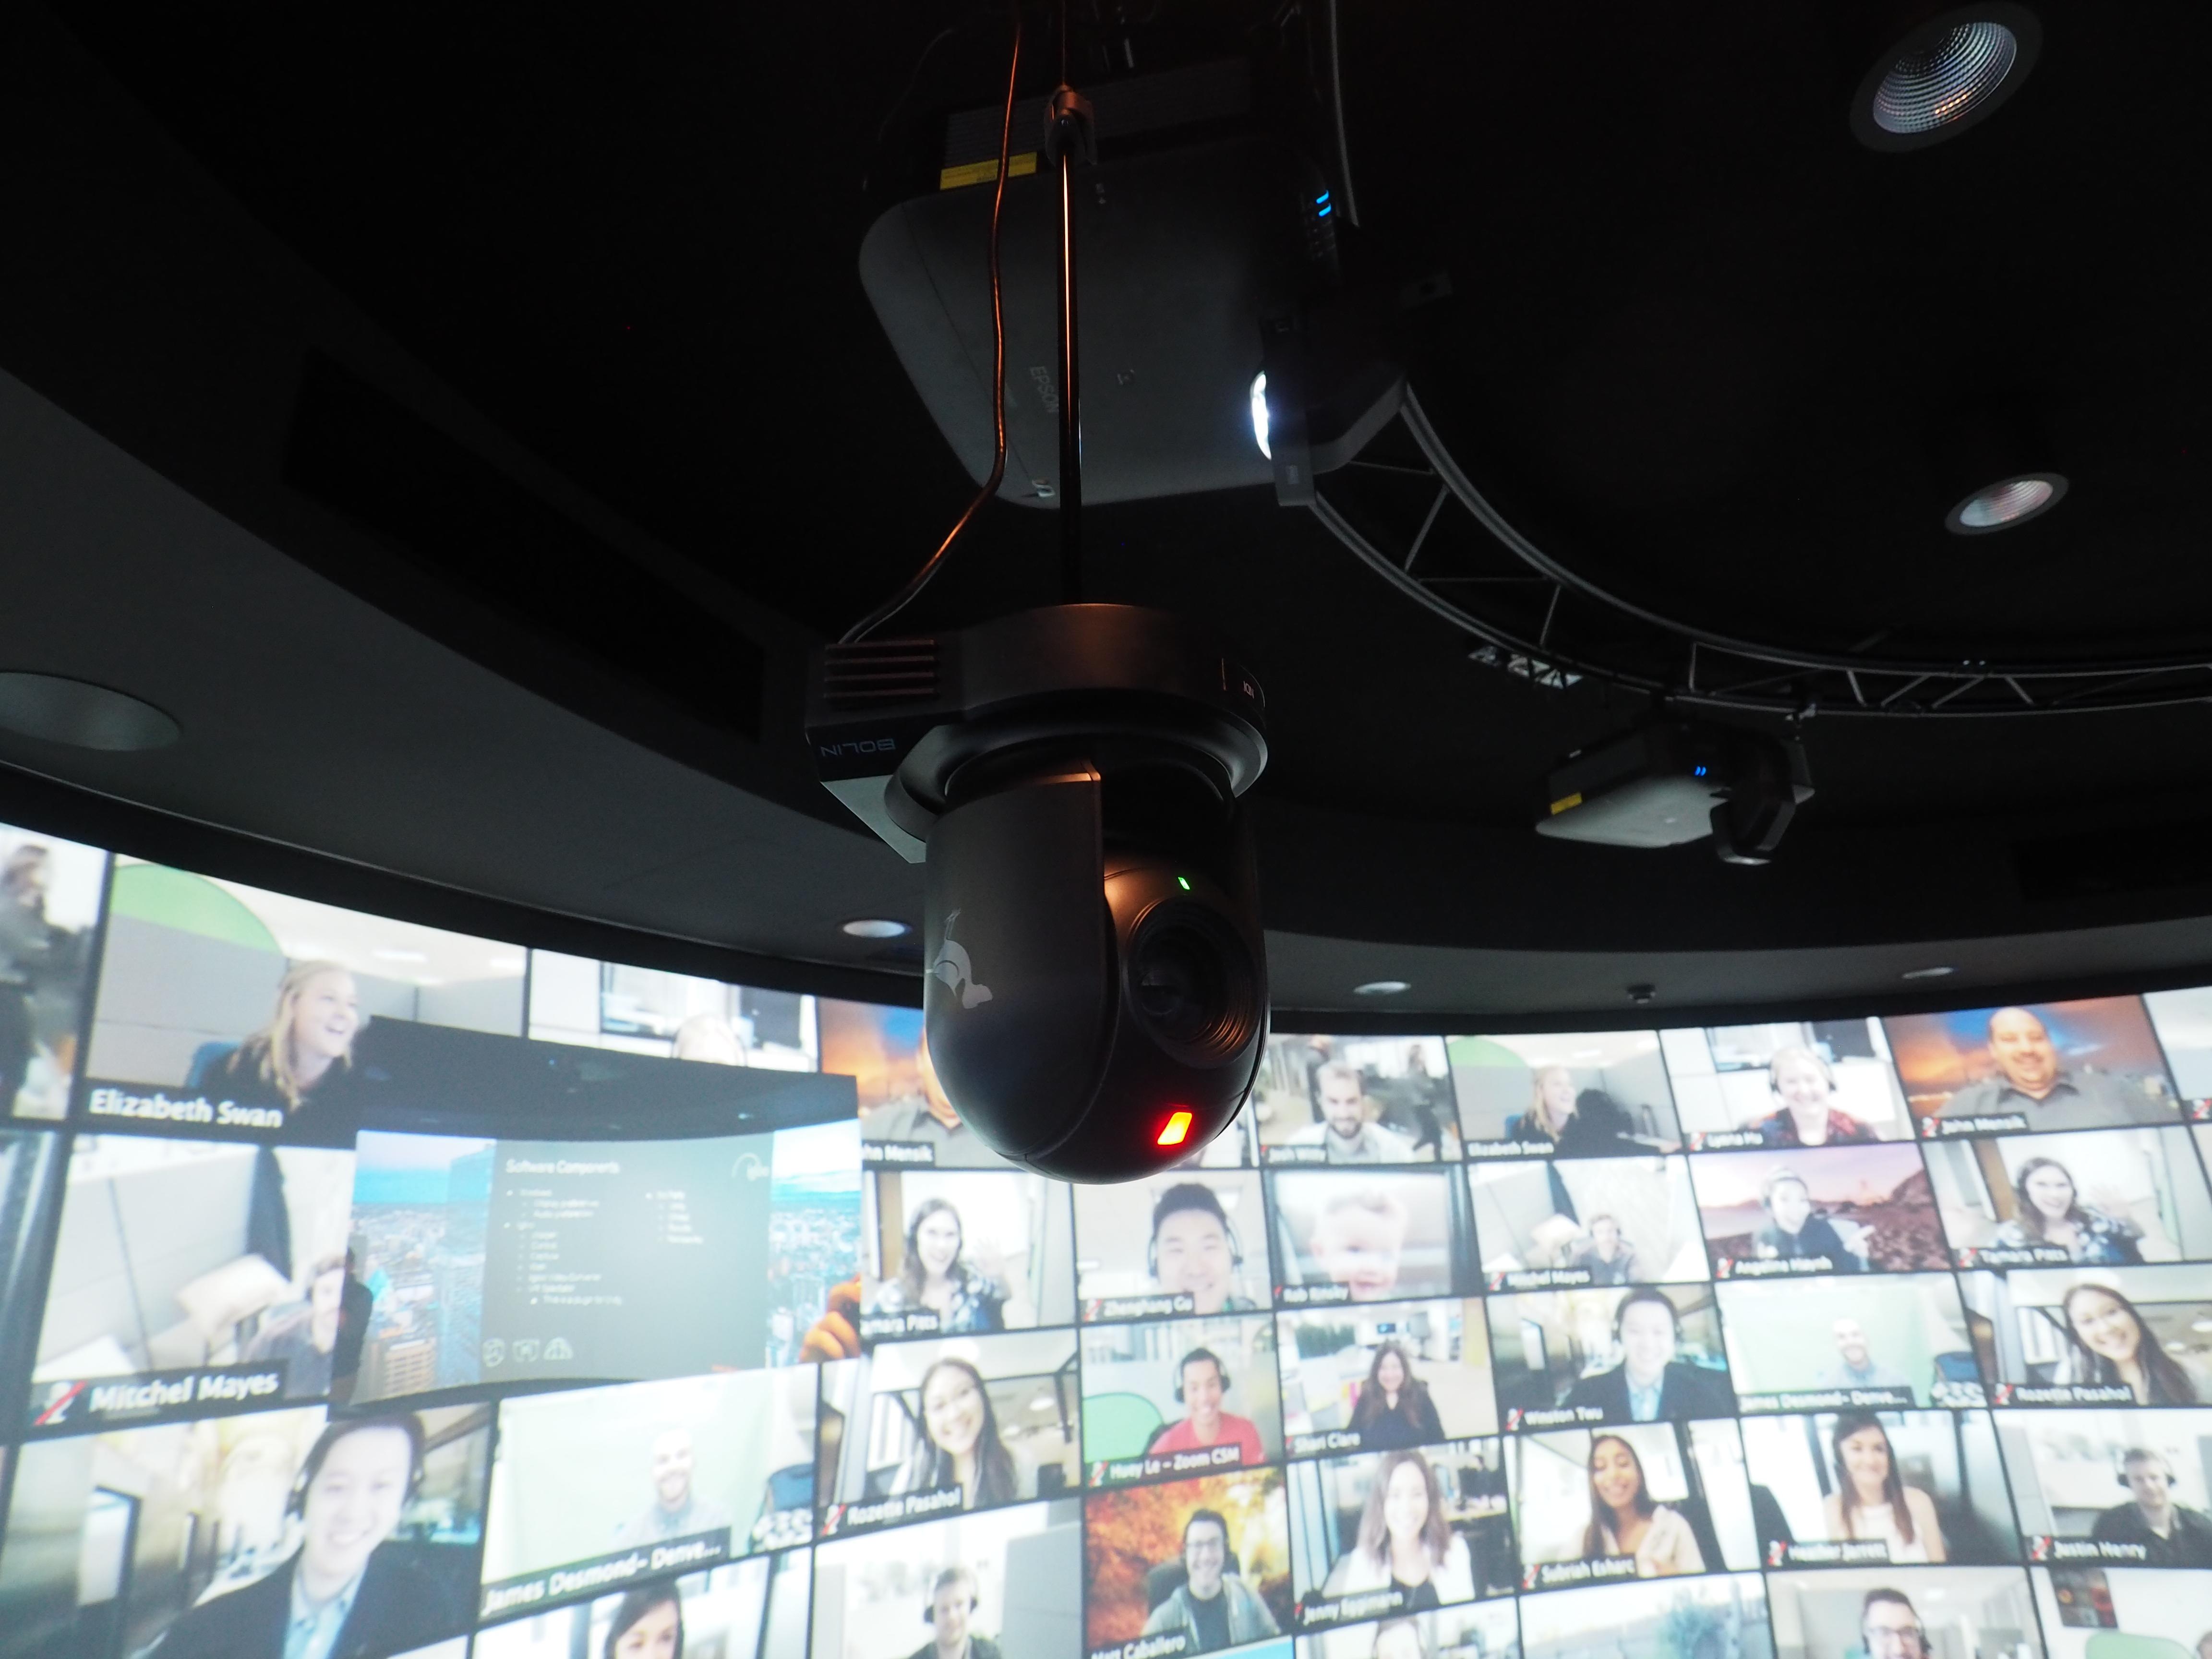 A BirdDog camera in the Deakin Imaginarium.